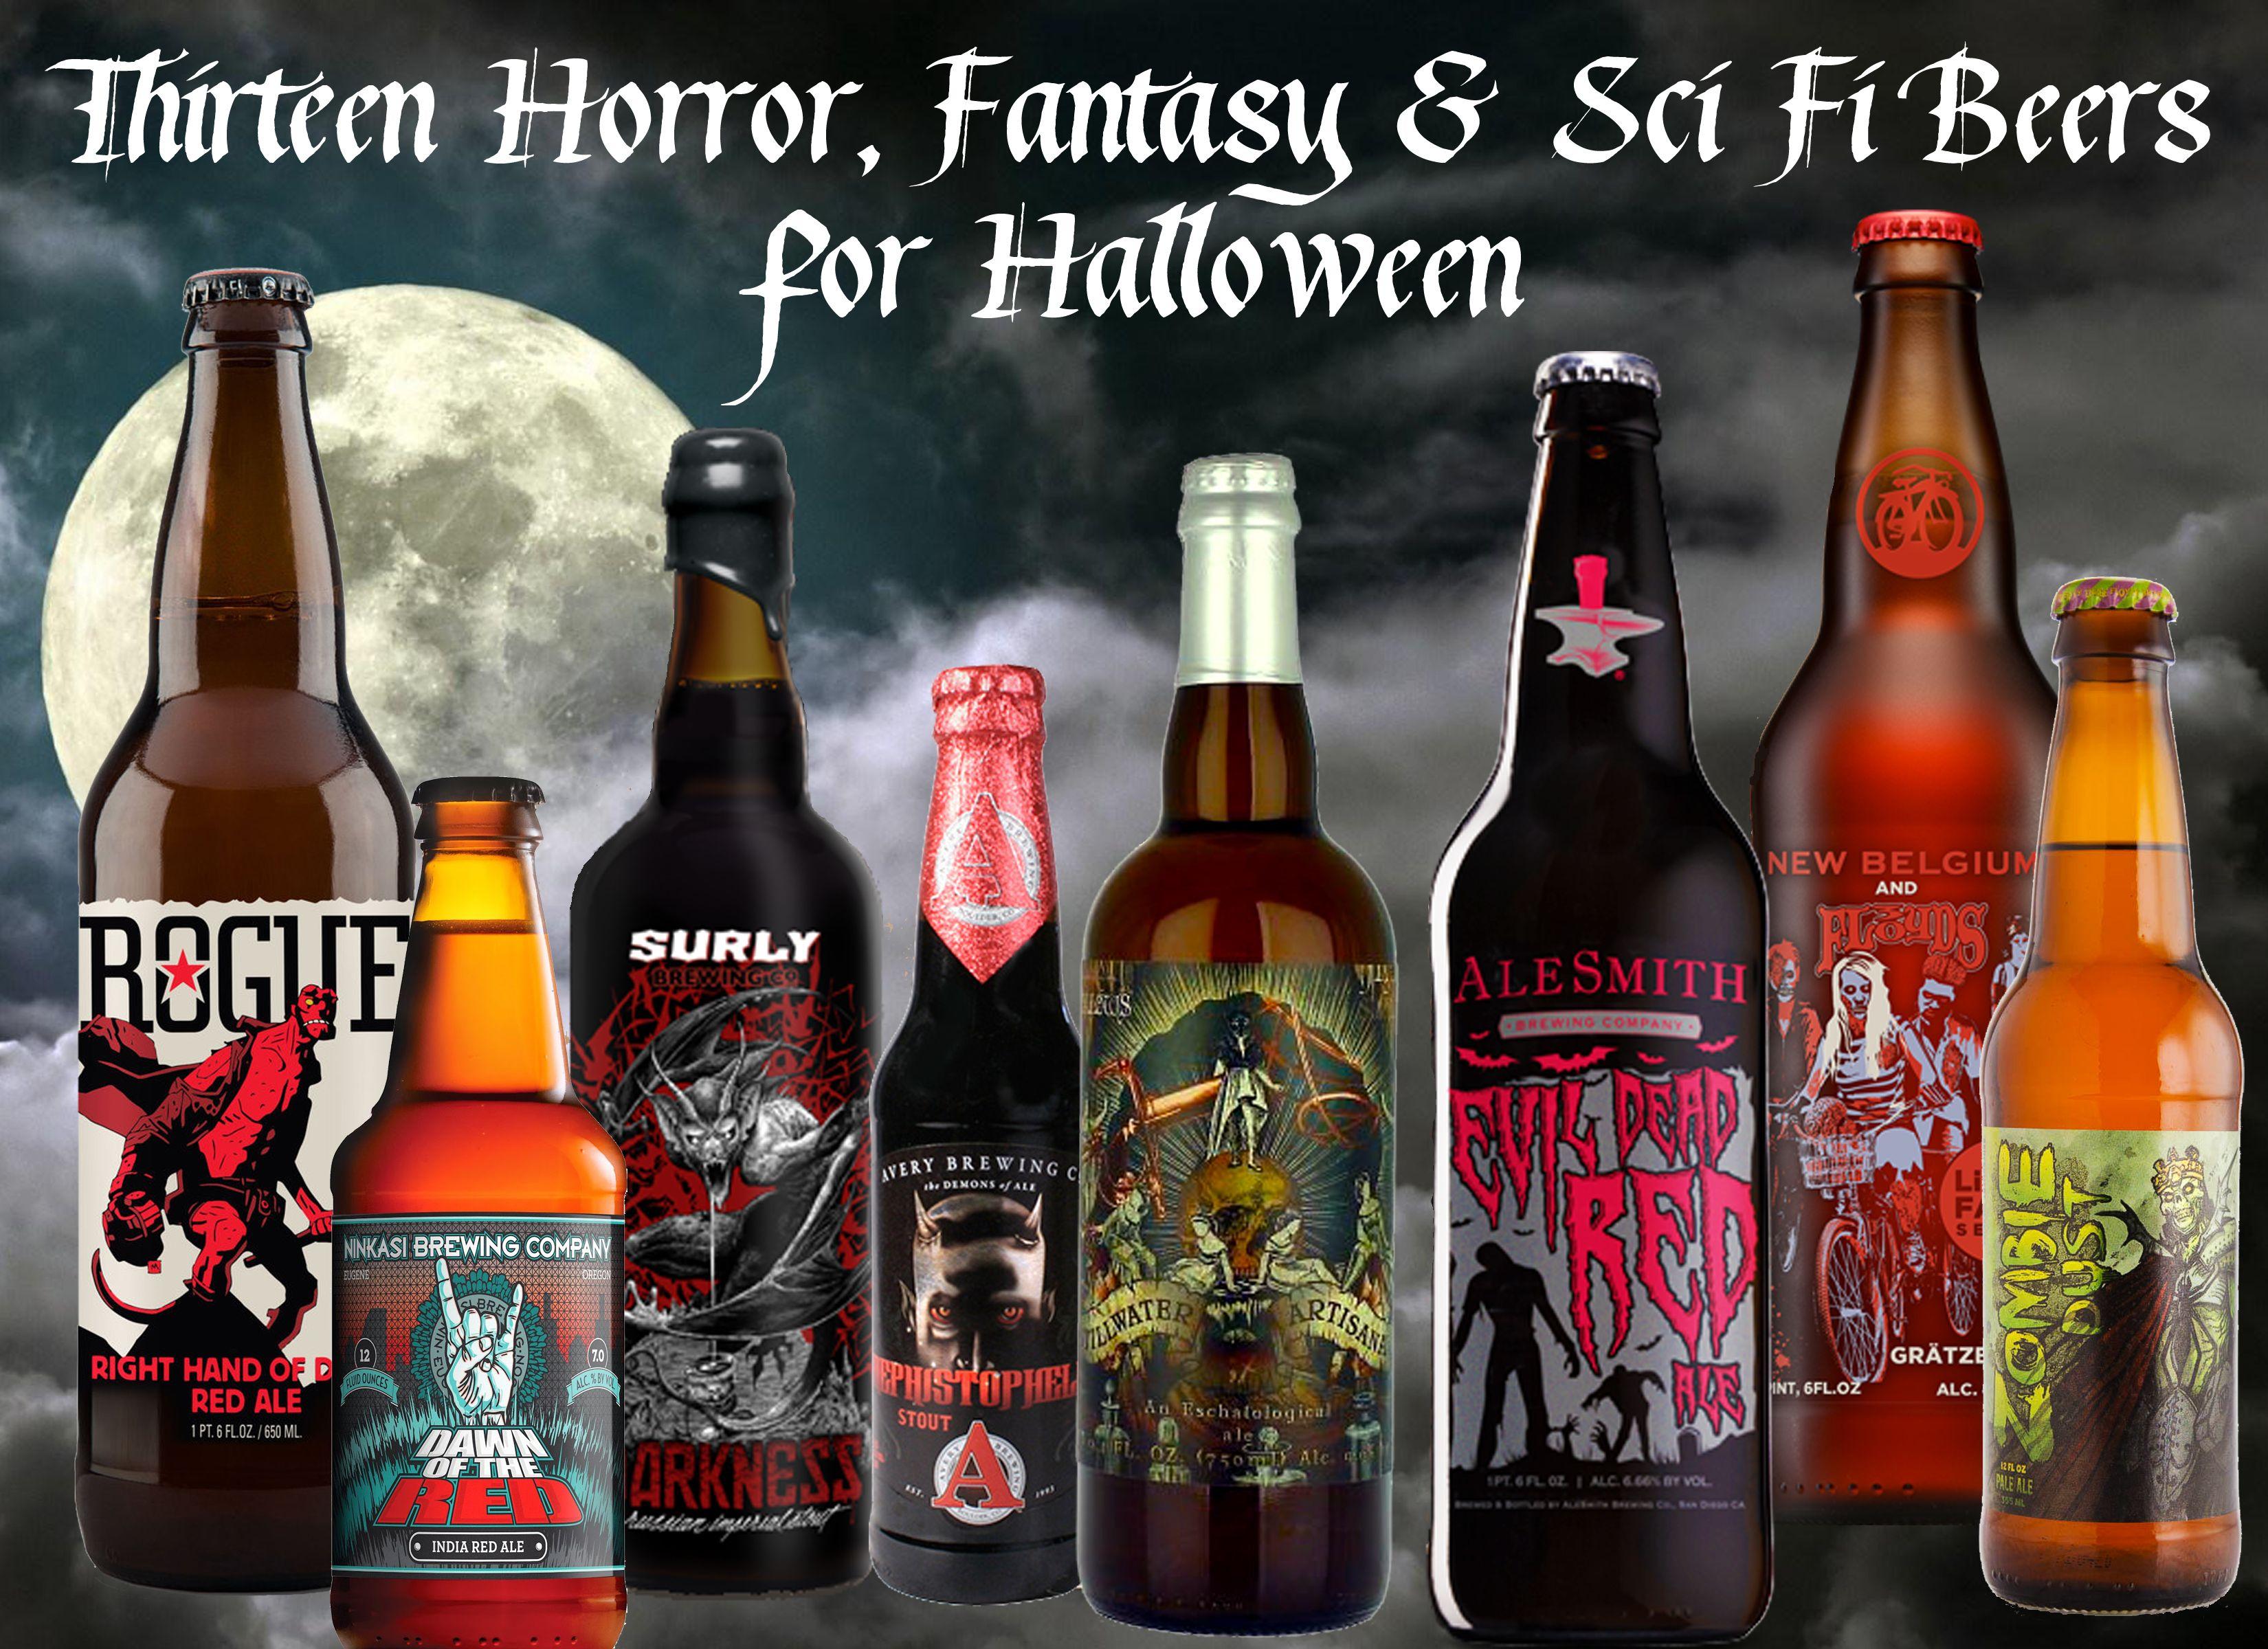 Thirteen Best Horror Fantasy And Sci Fi Beer Names Beer